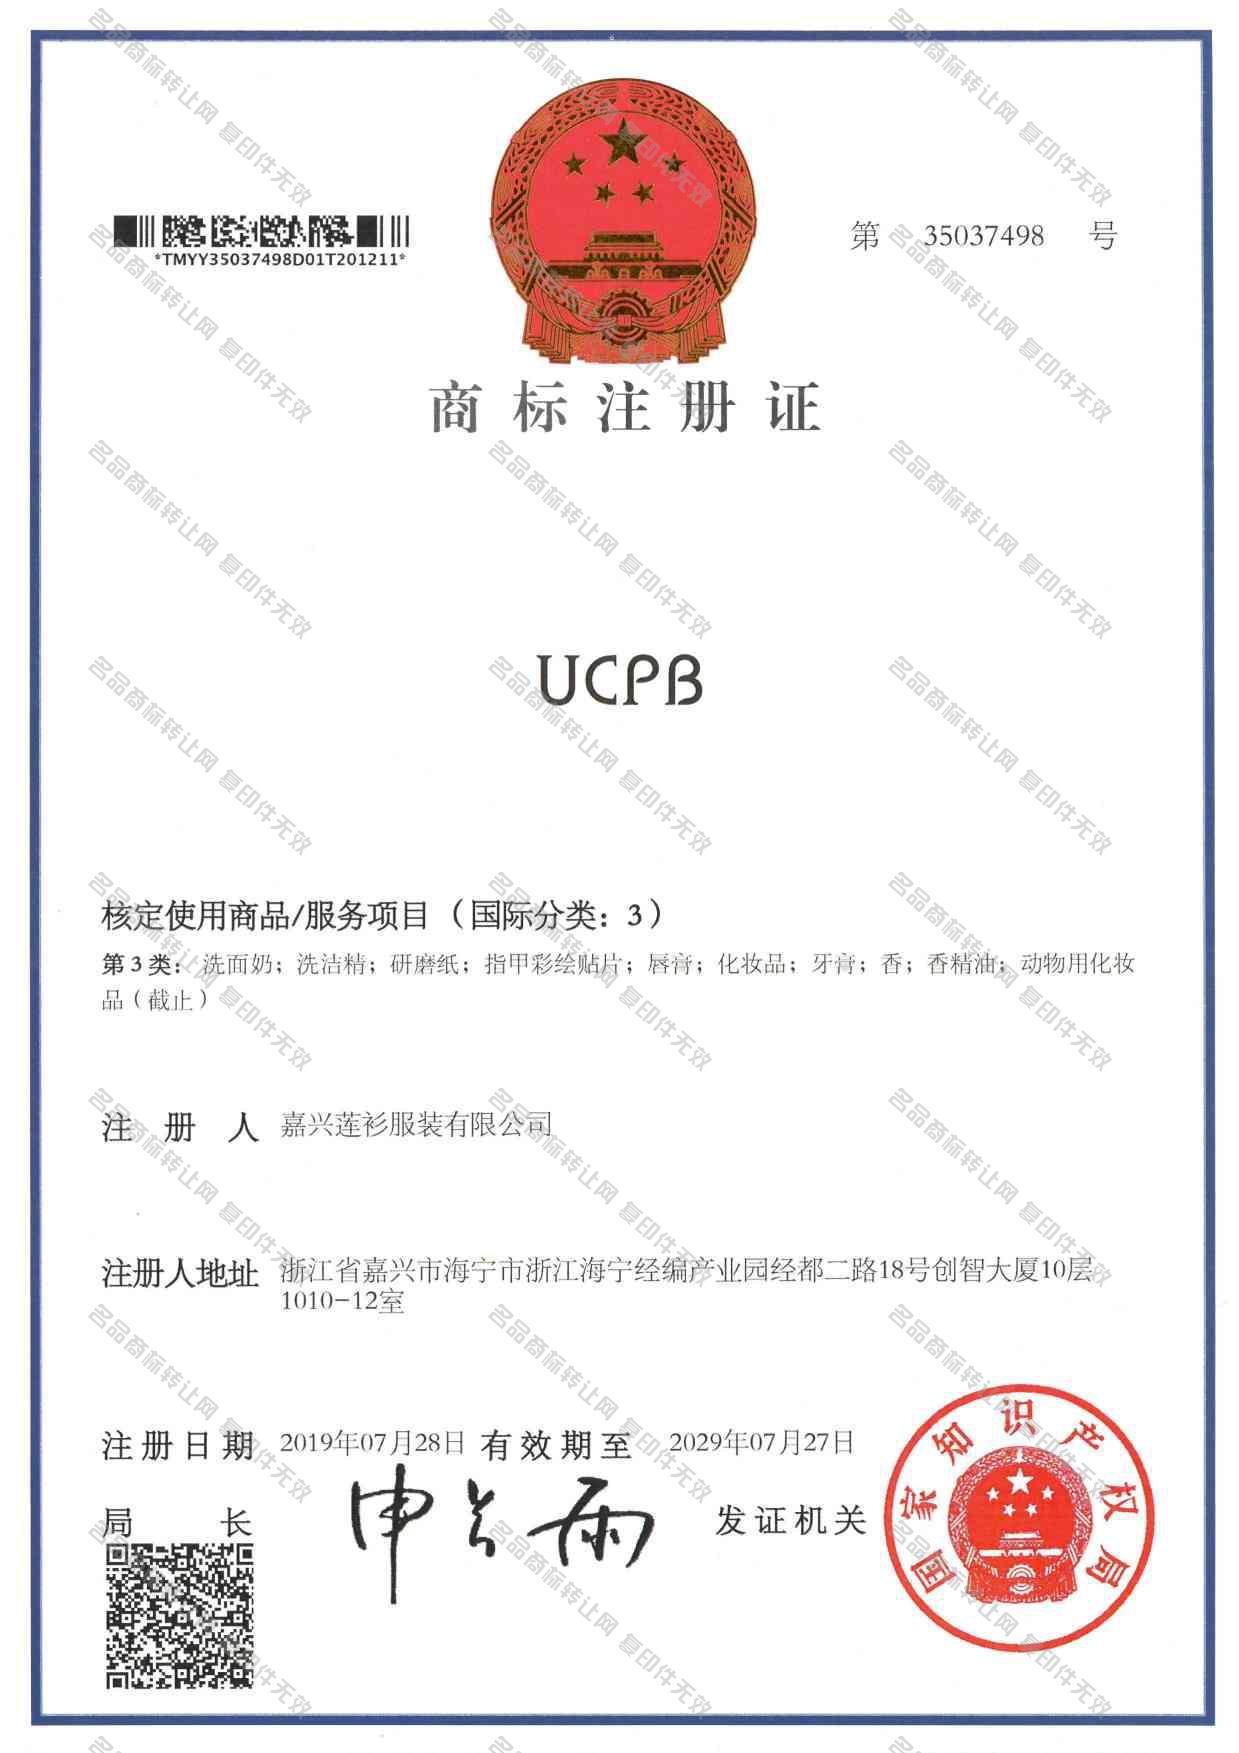 UCPB注册证